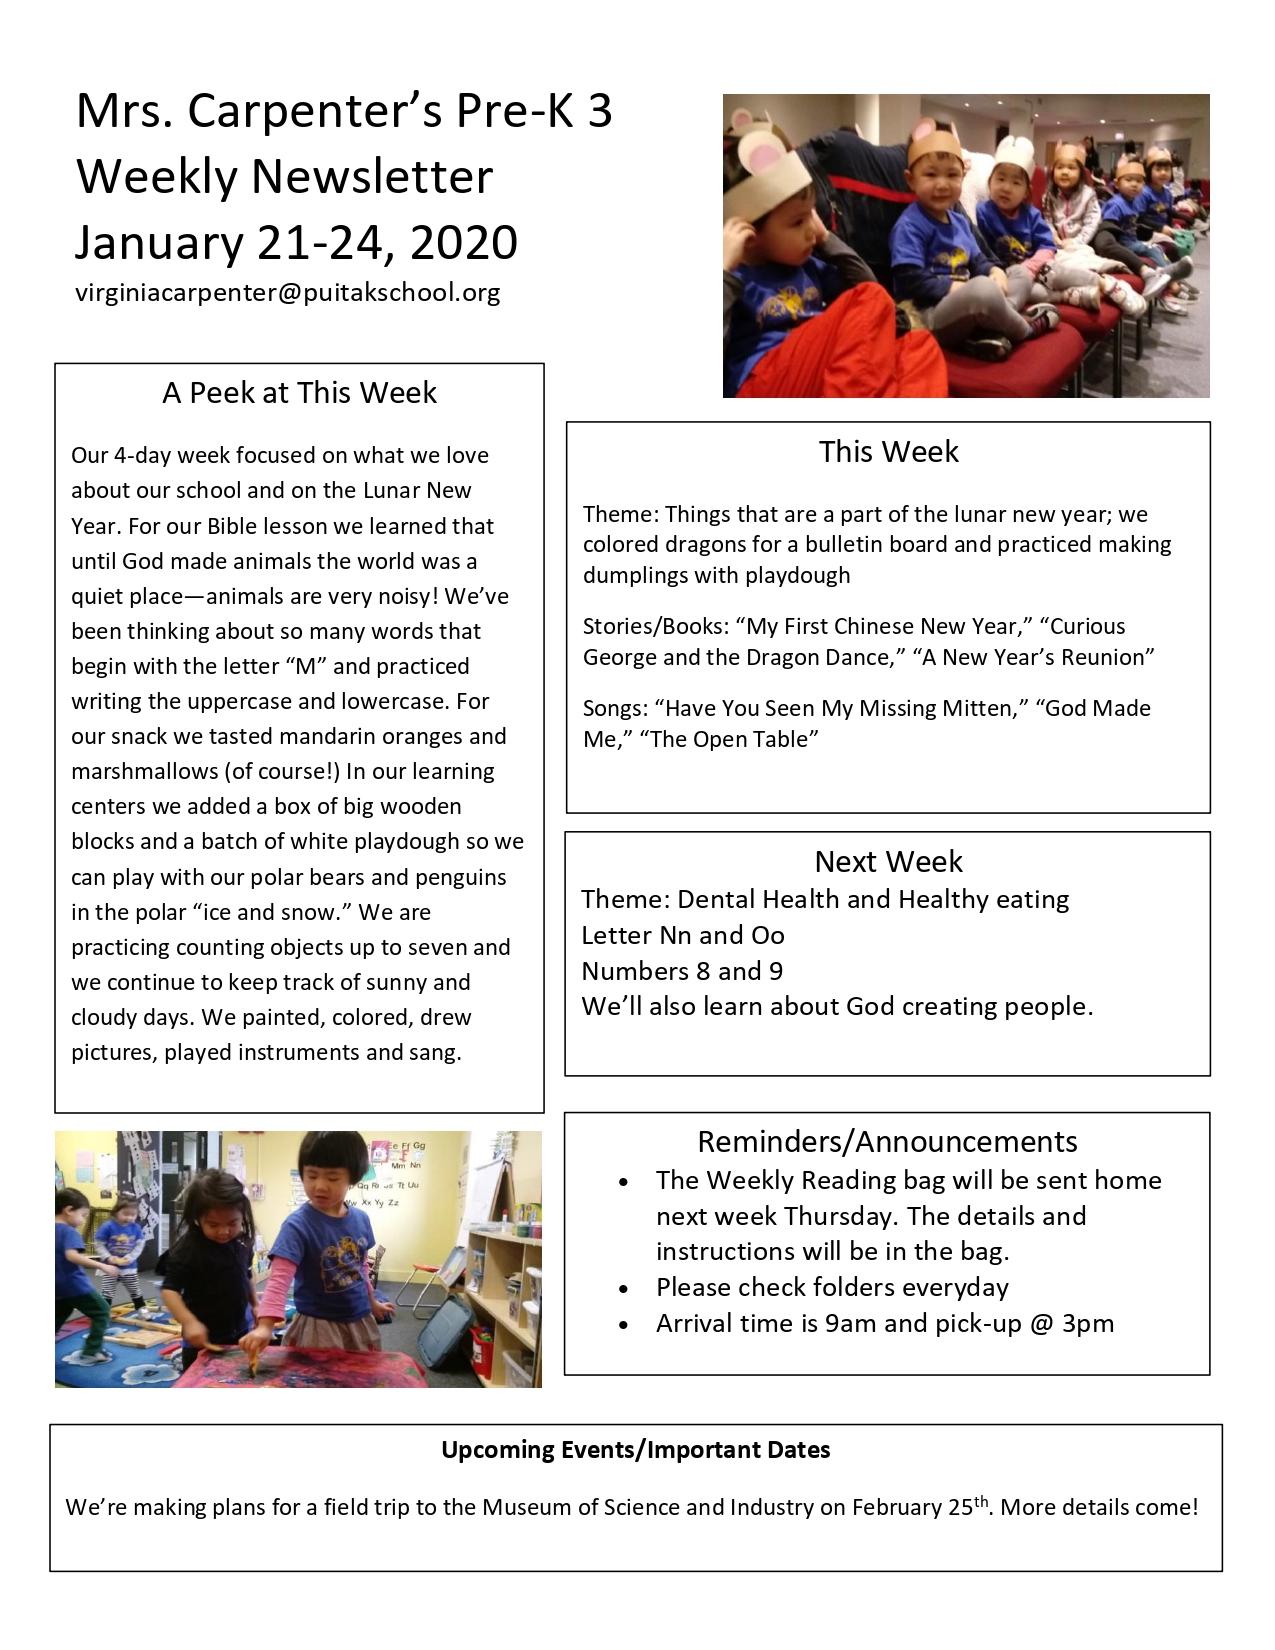 GinnyNewsletter2020January4thWeek_page-0